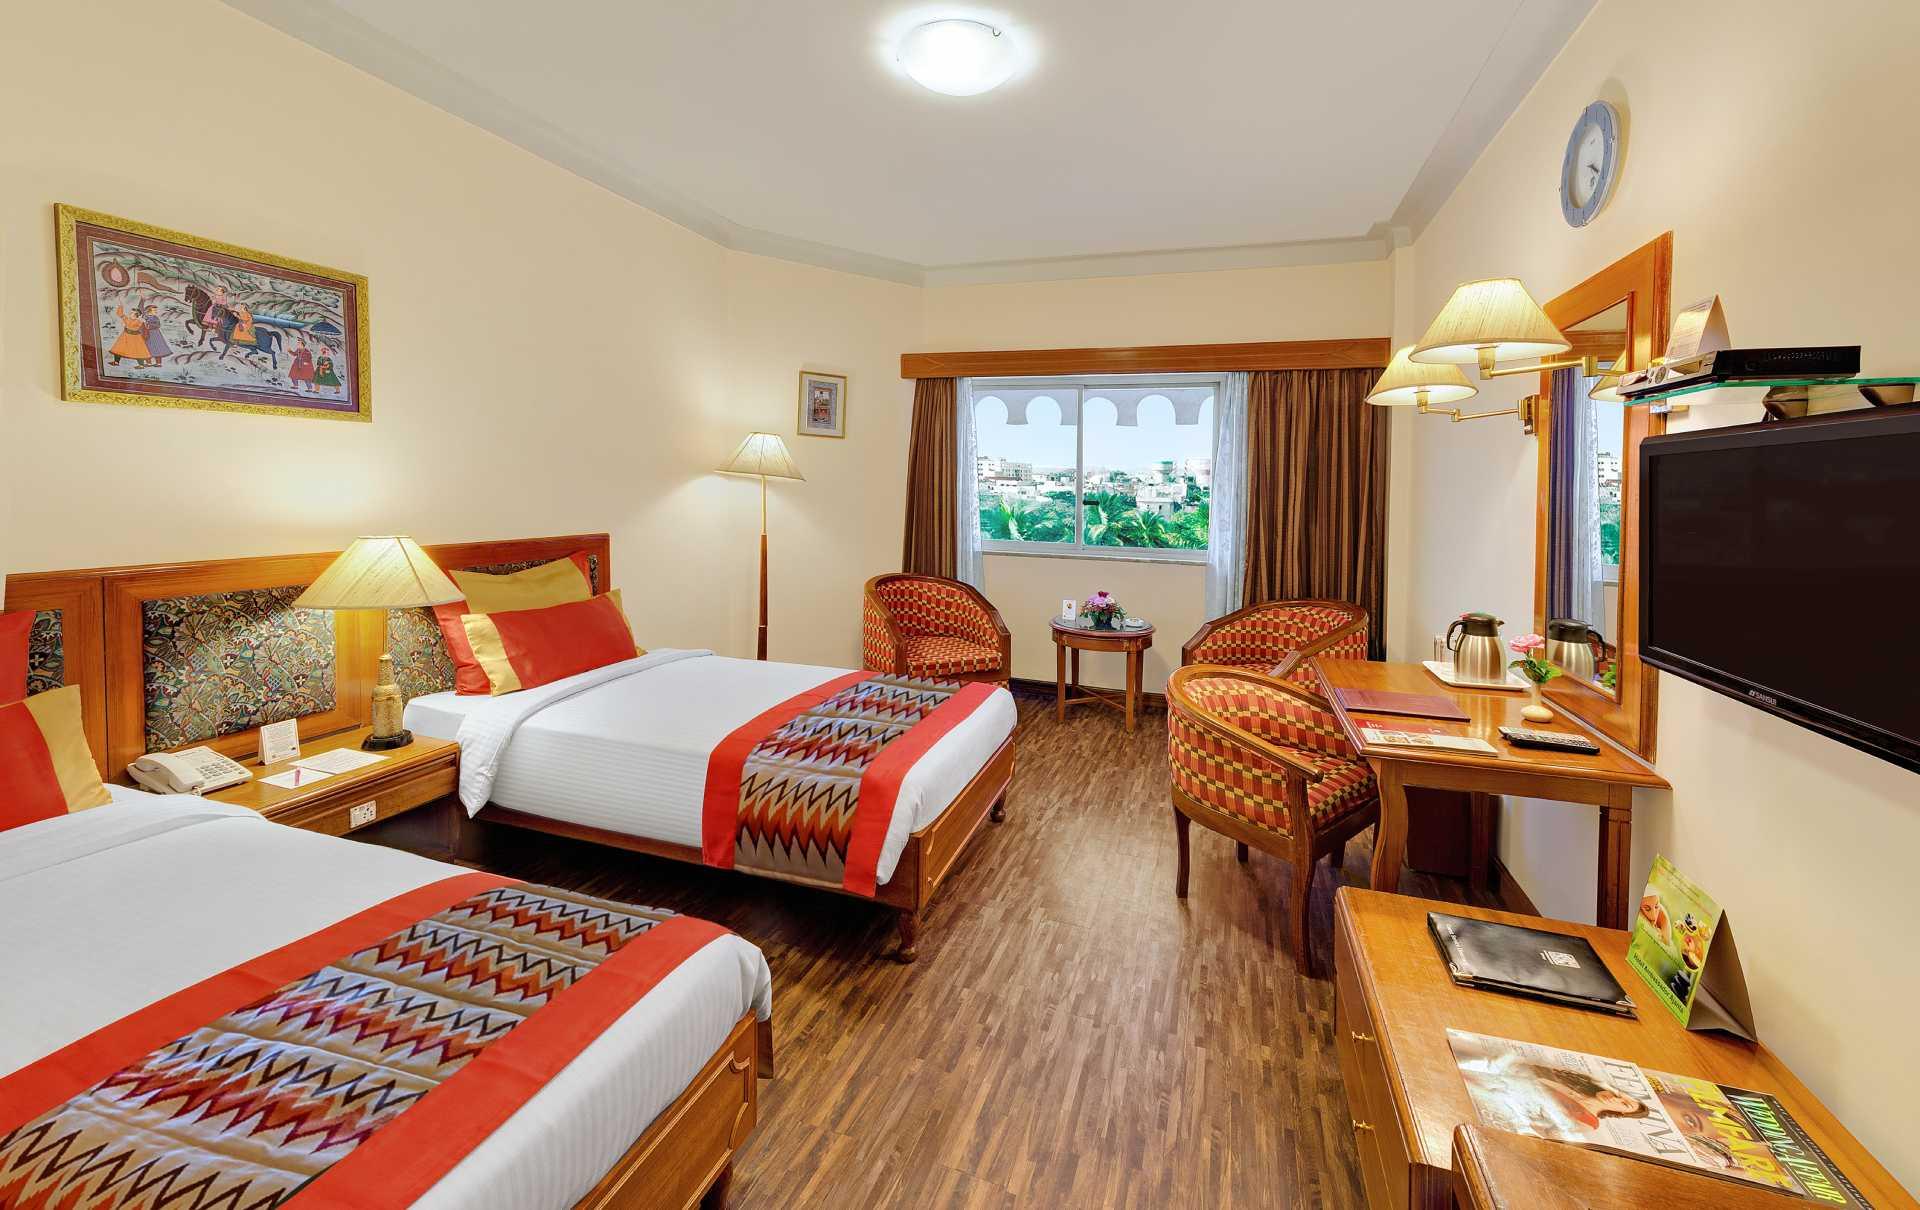 Deluxe Room Ambassador Ajanta Aurangabad banner 3 - The Ambassador | Heritage Hotels in Mumbai, Aurangabad, Chennai - Our Rooms